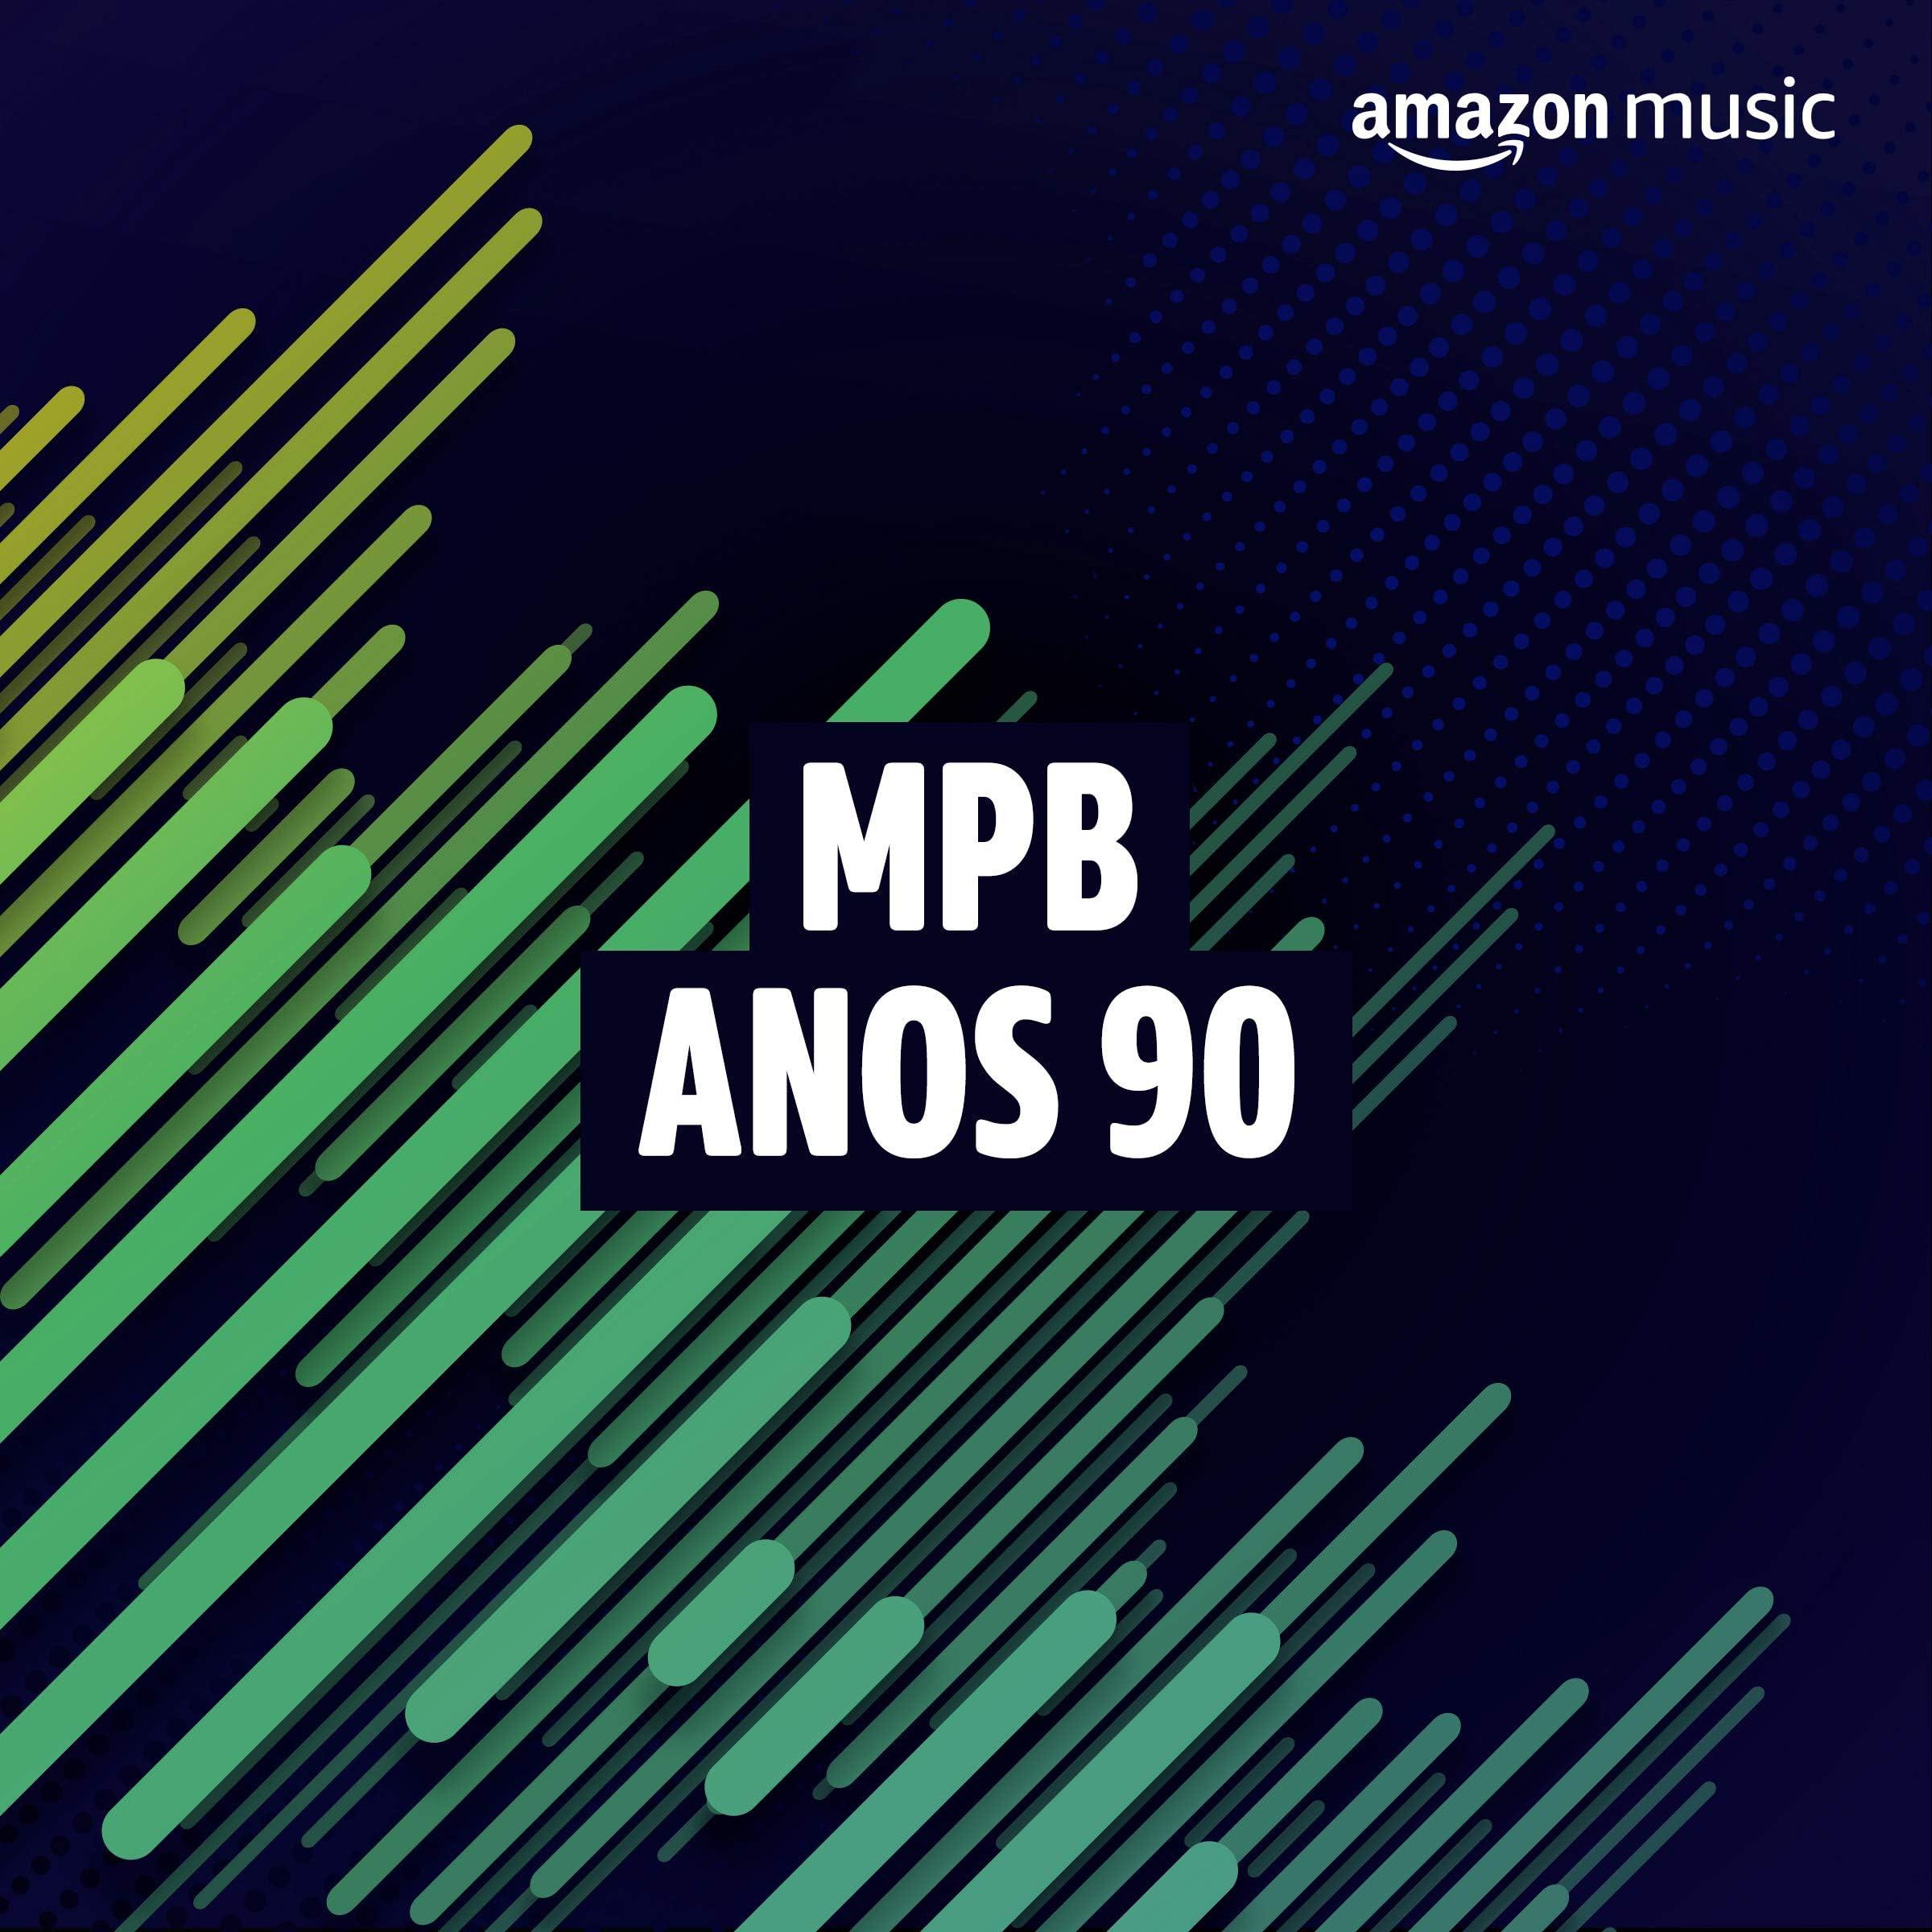 MPB Anos 90s